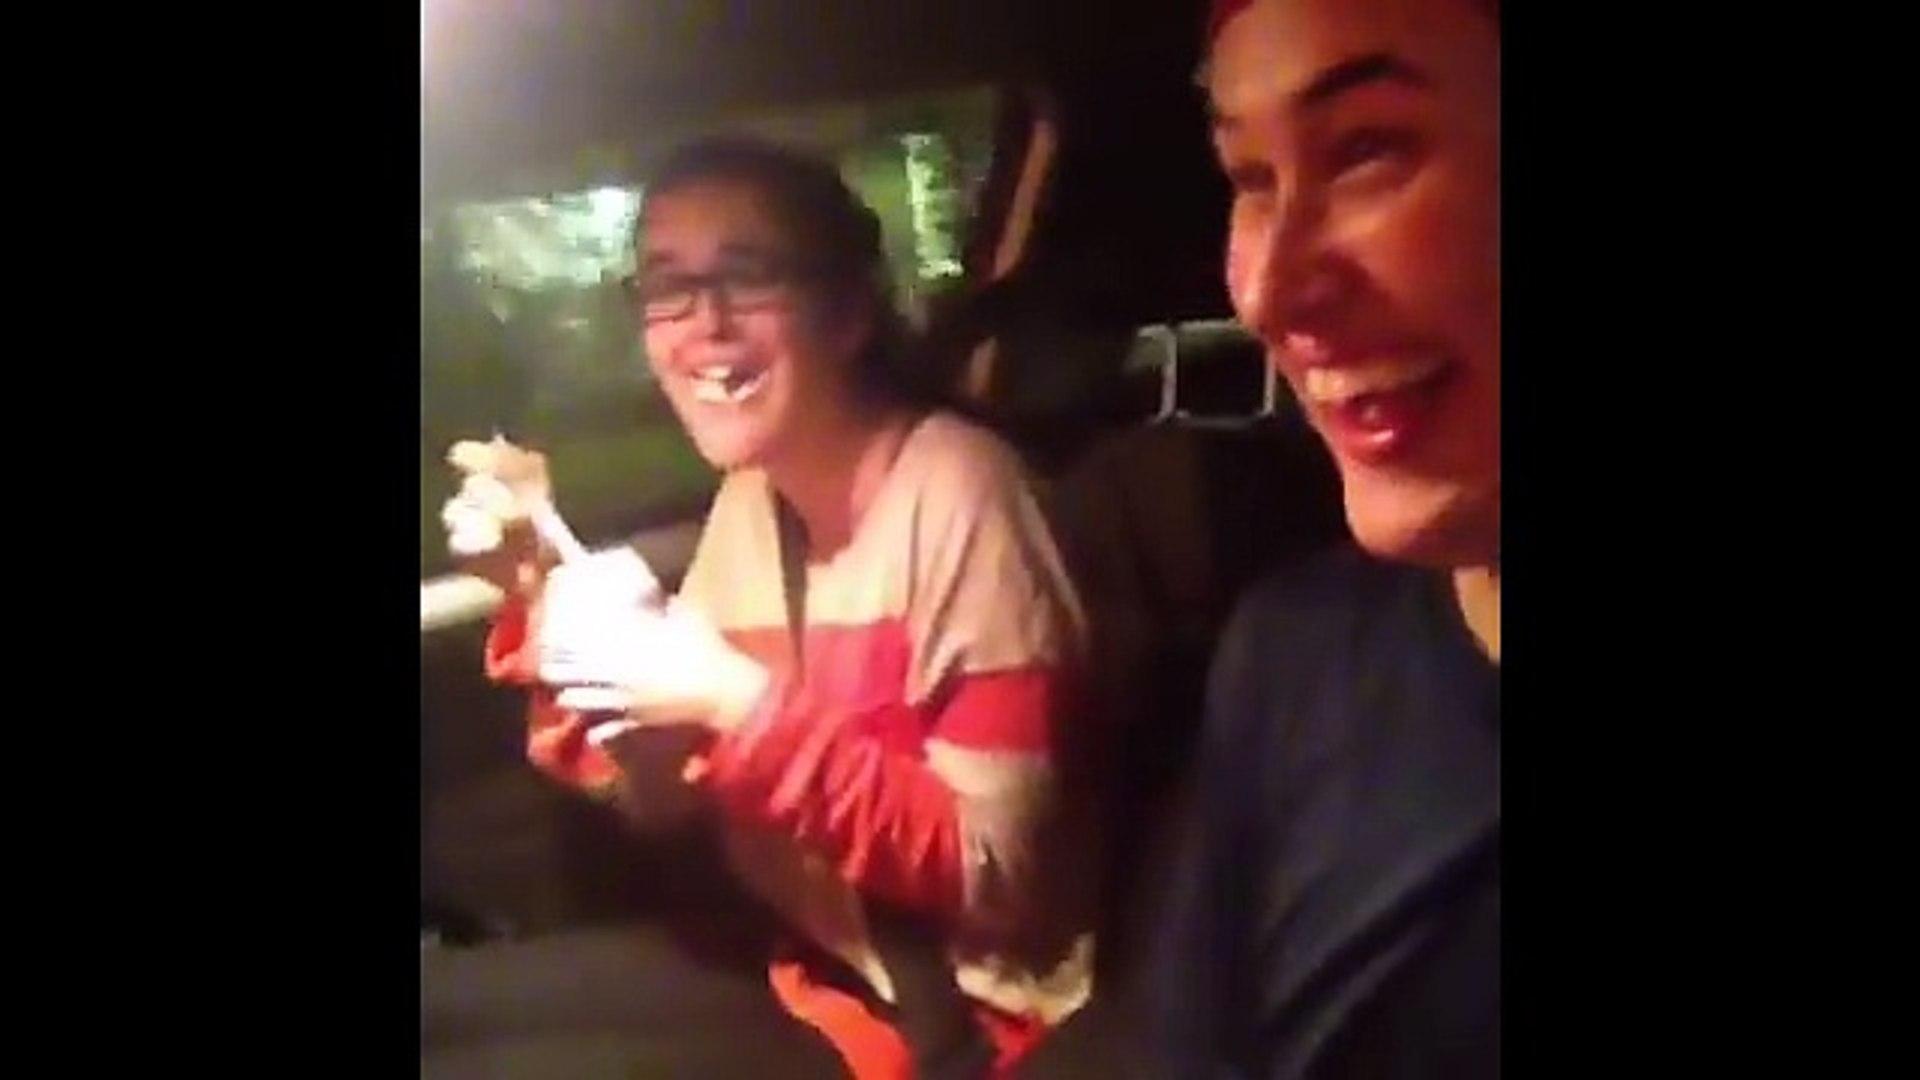 New Funny Videos - Funny Pranks 2015 - Scary Pranks TOP Funny Pranks Compilation 2016_15